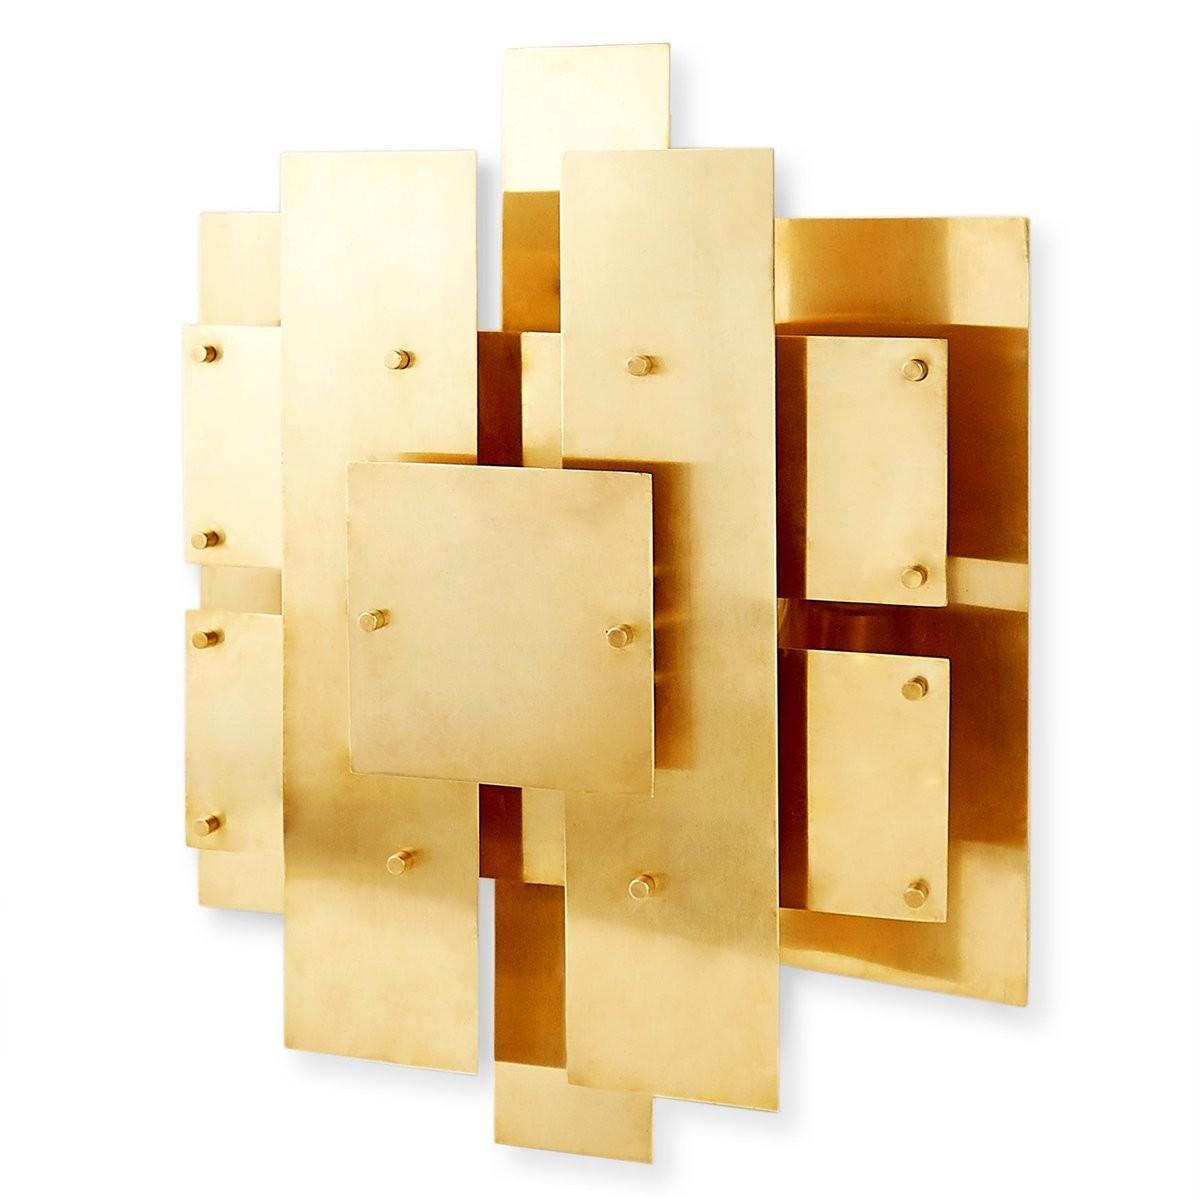 Jonathan Adler I Puzzle Sconce